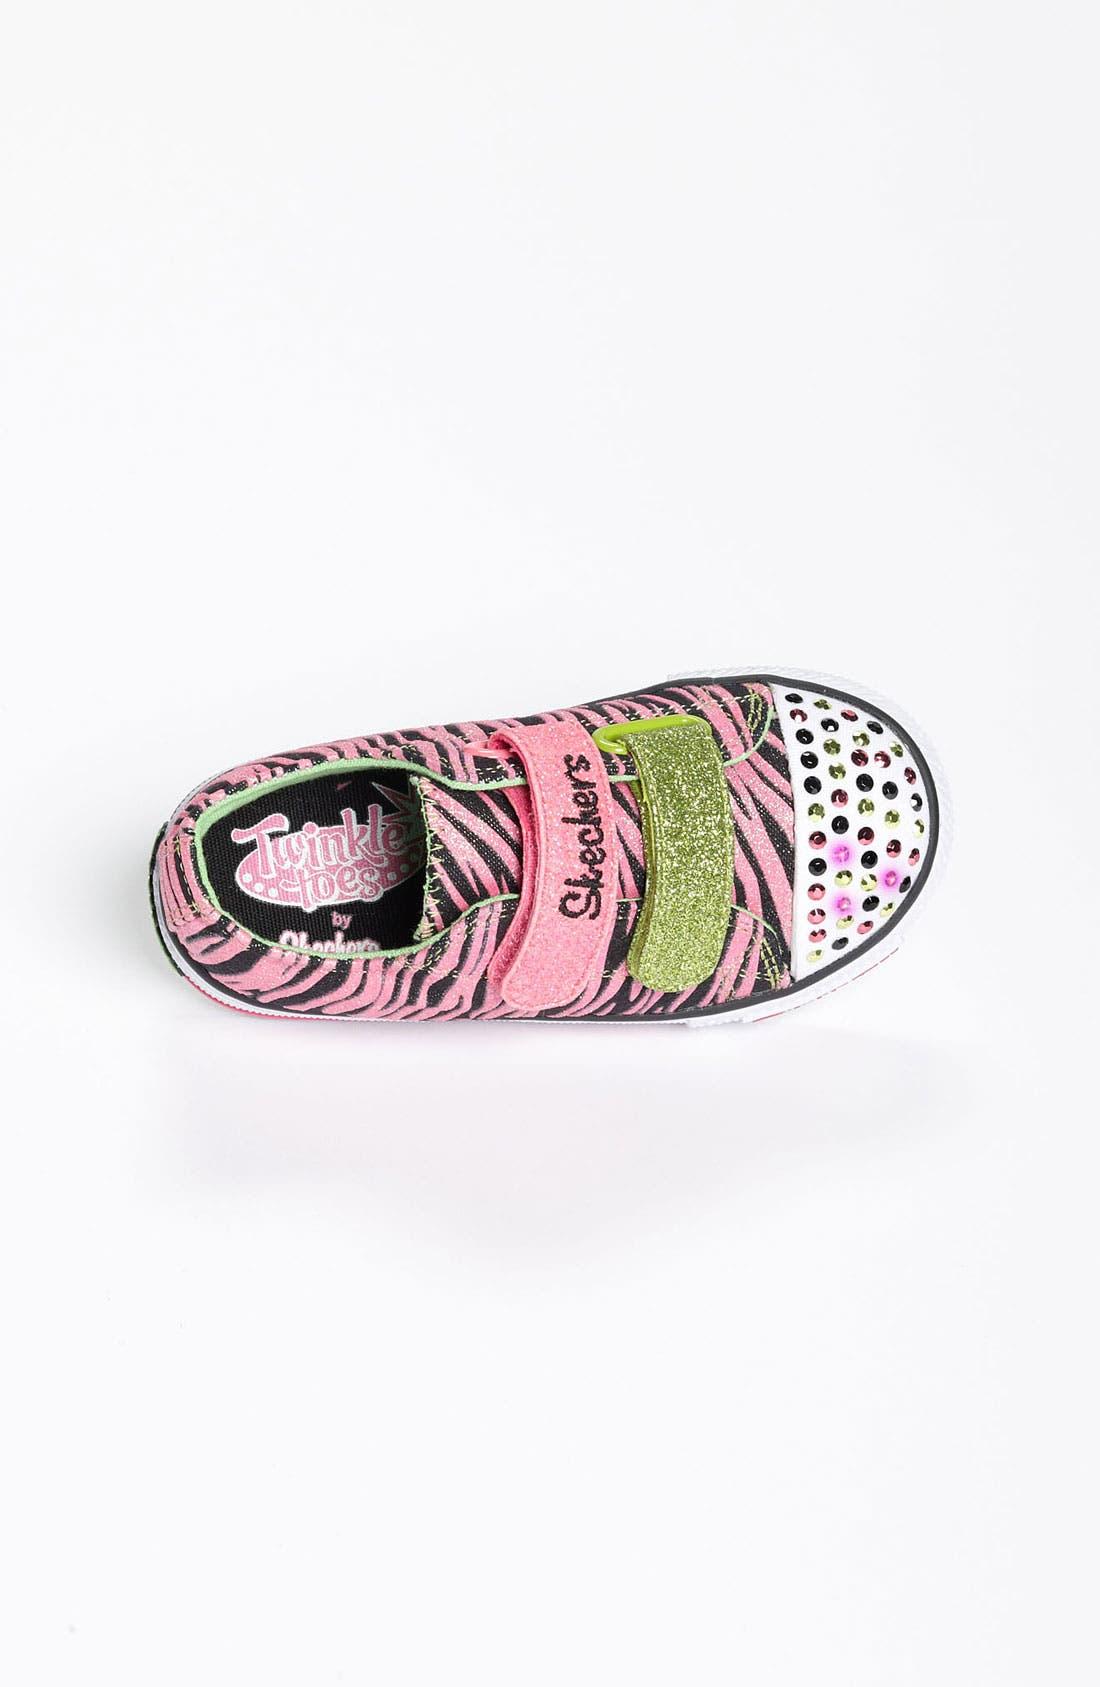 Alternate Image 3  - SKECHERS 'Twinkle Toes' Light-Up Sneaker (Walker & Toddler)(Nordstrom Exclusive)